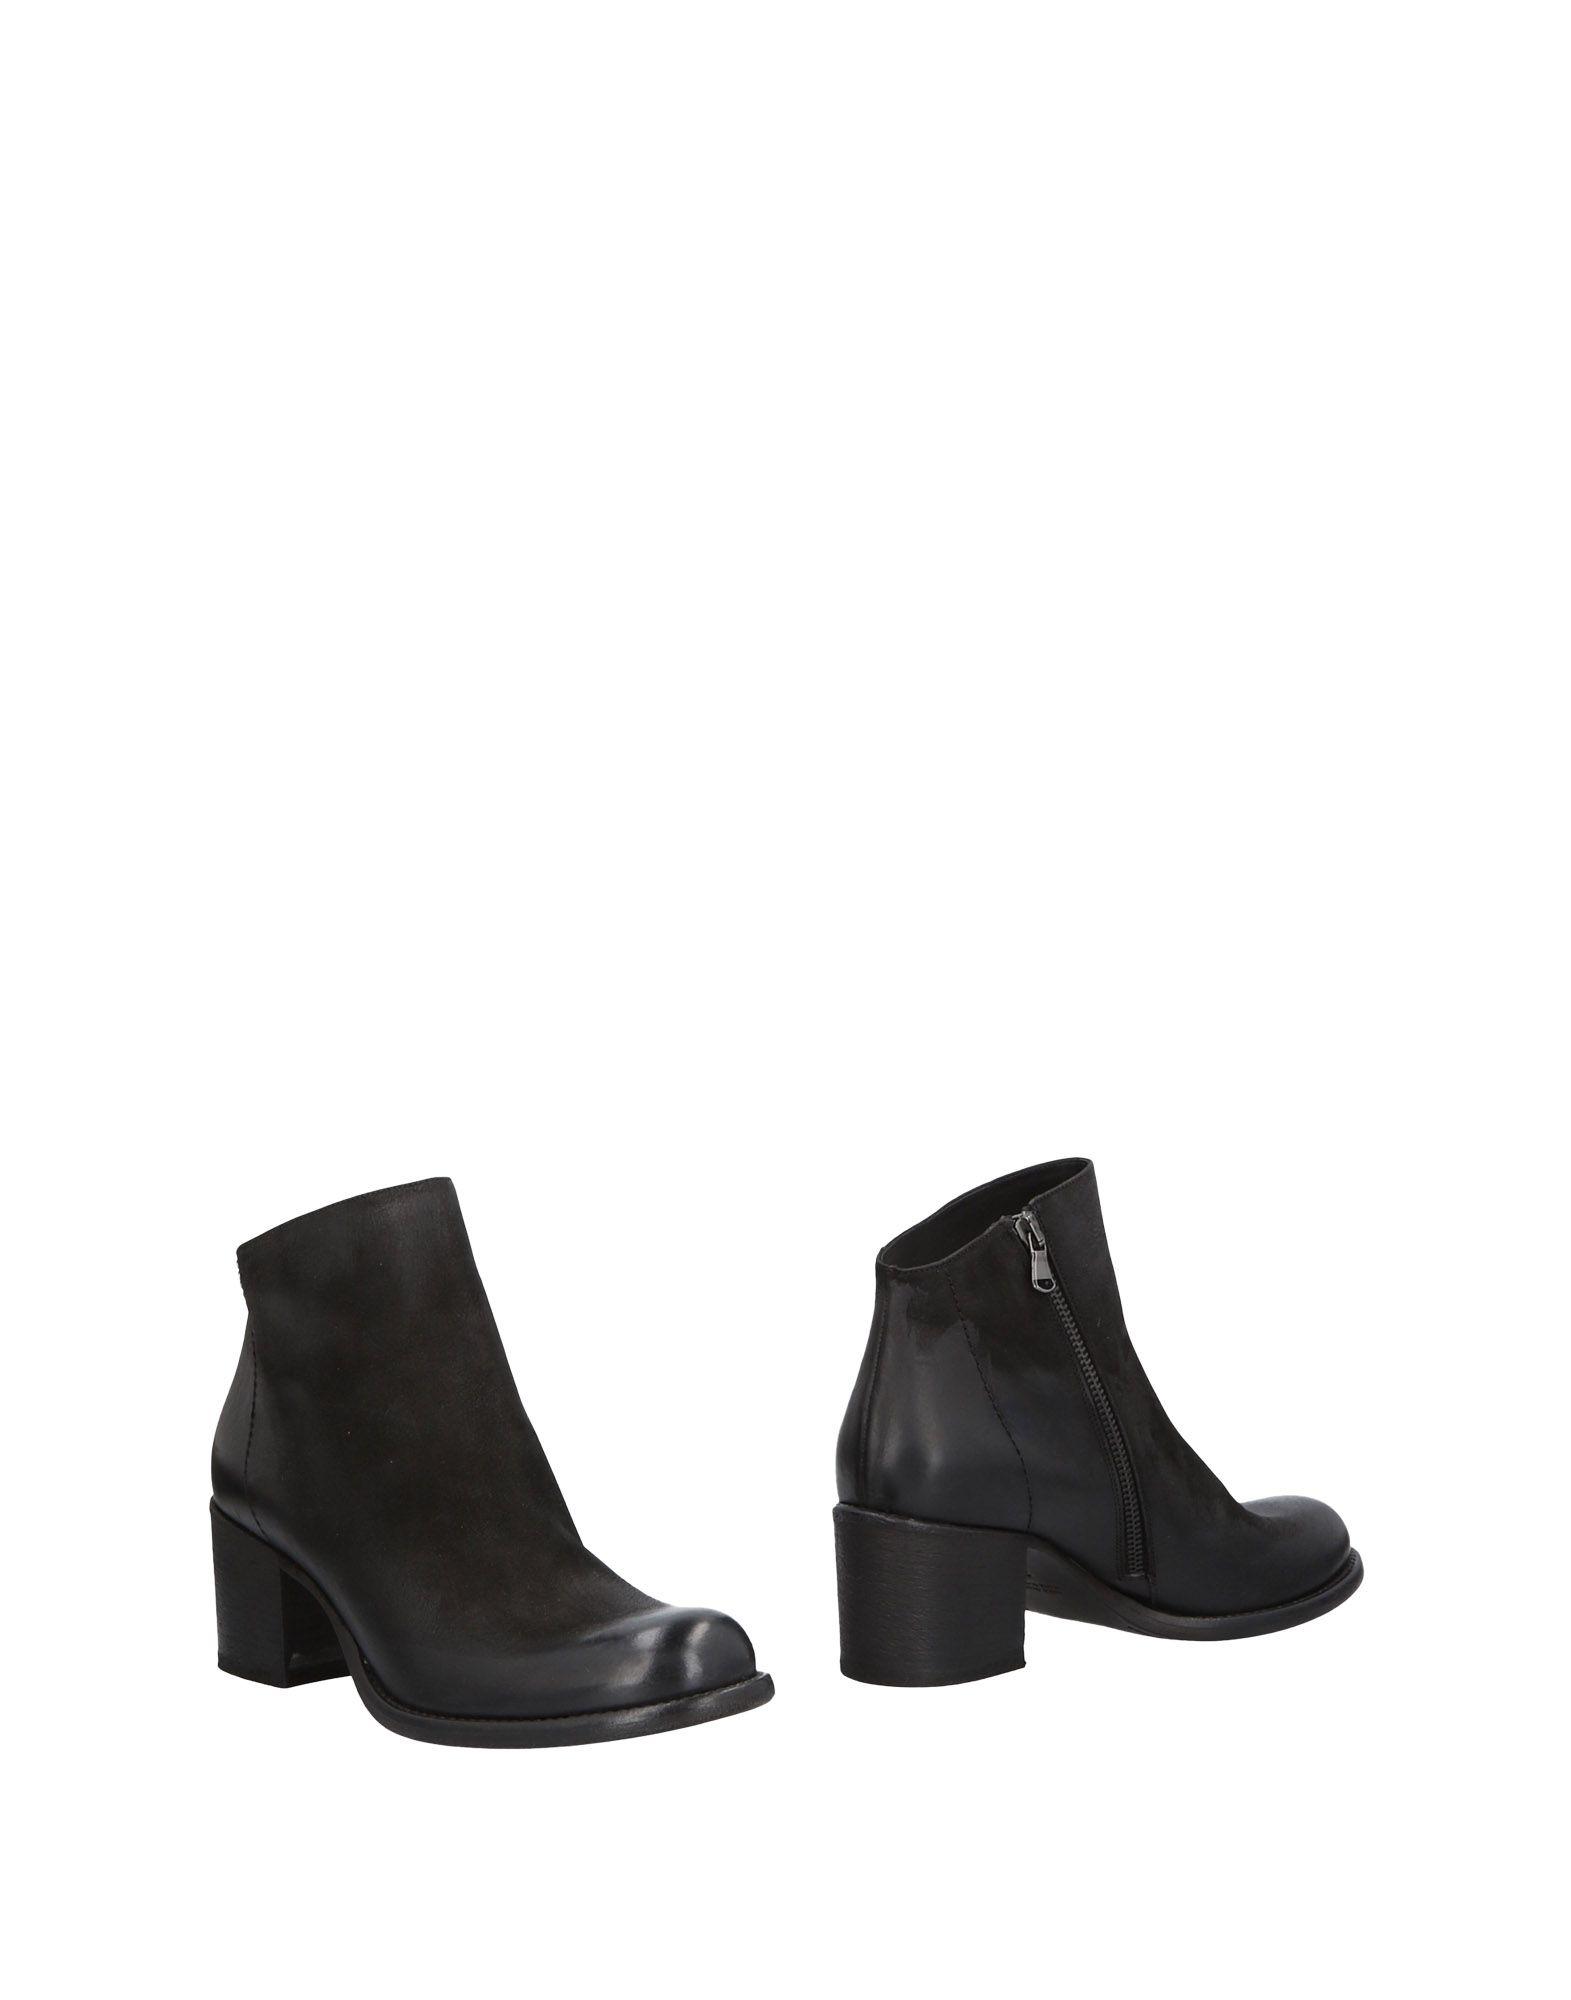 Nora Barth Stiefelette Damen  11471076FI Neue Schuhe